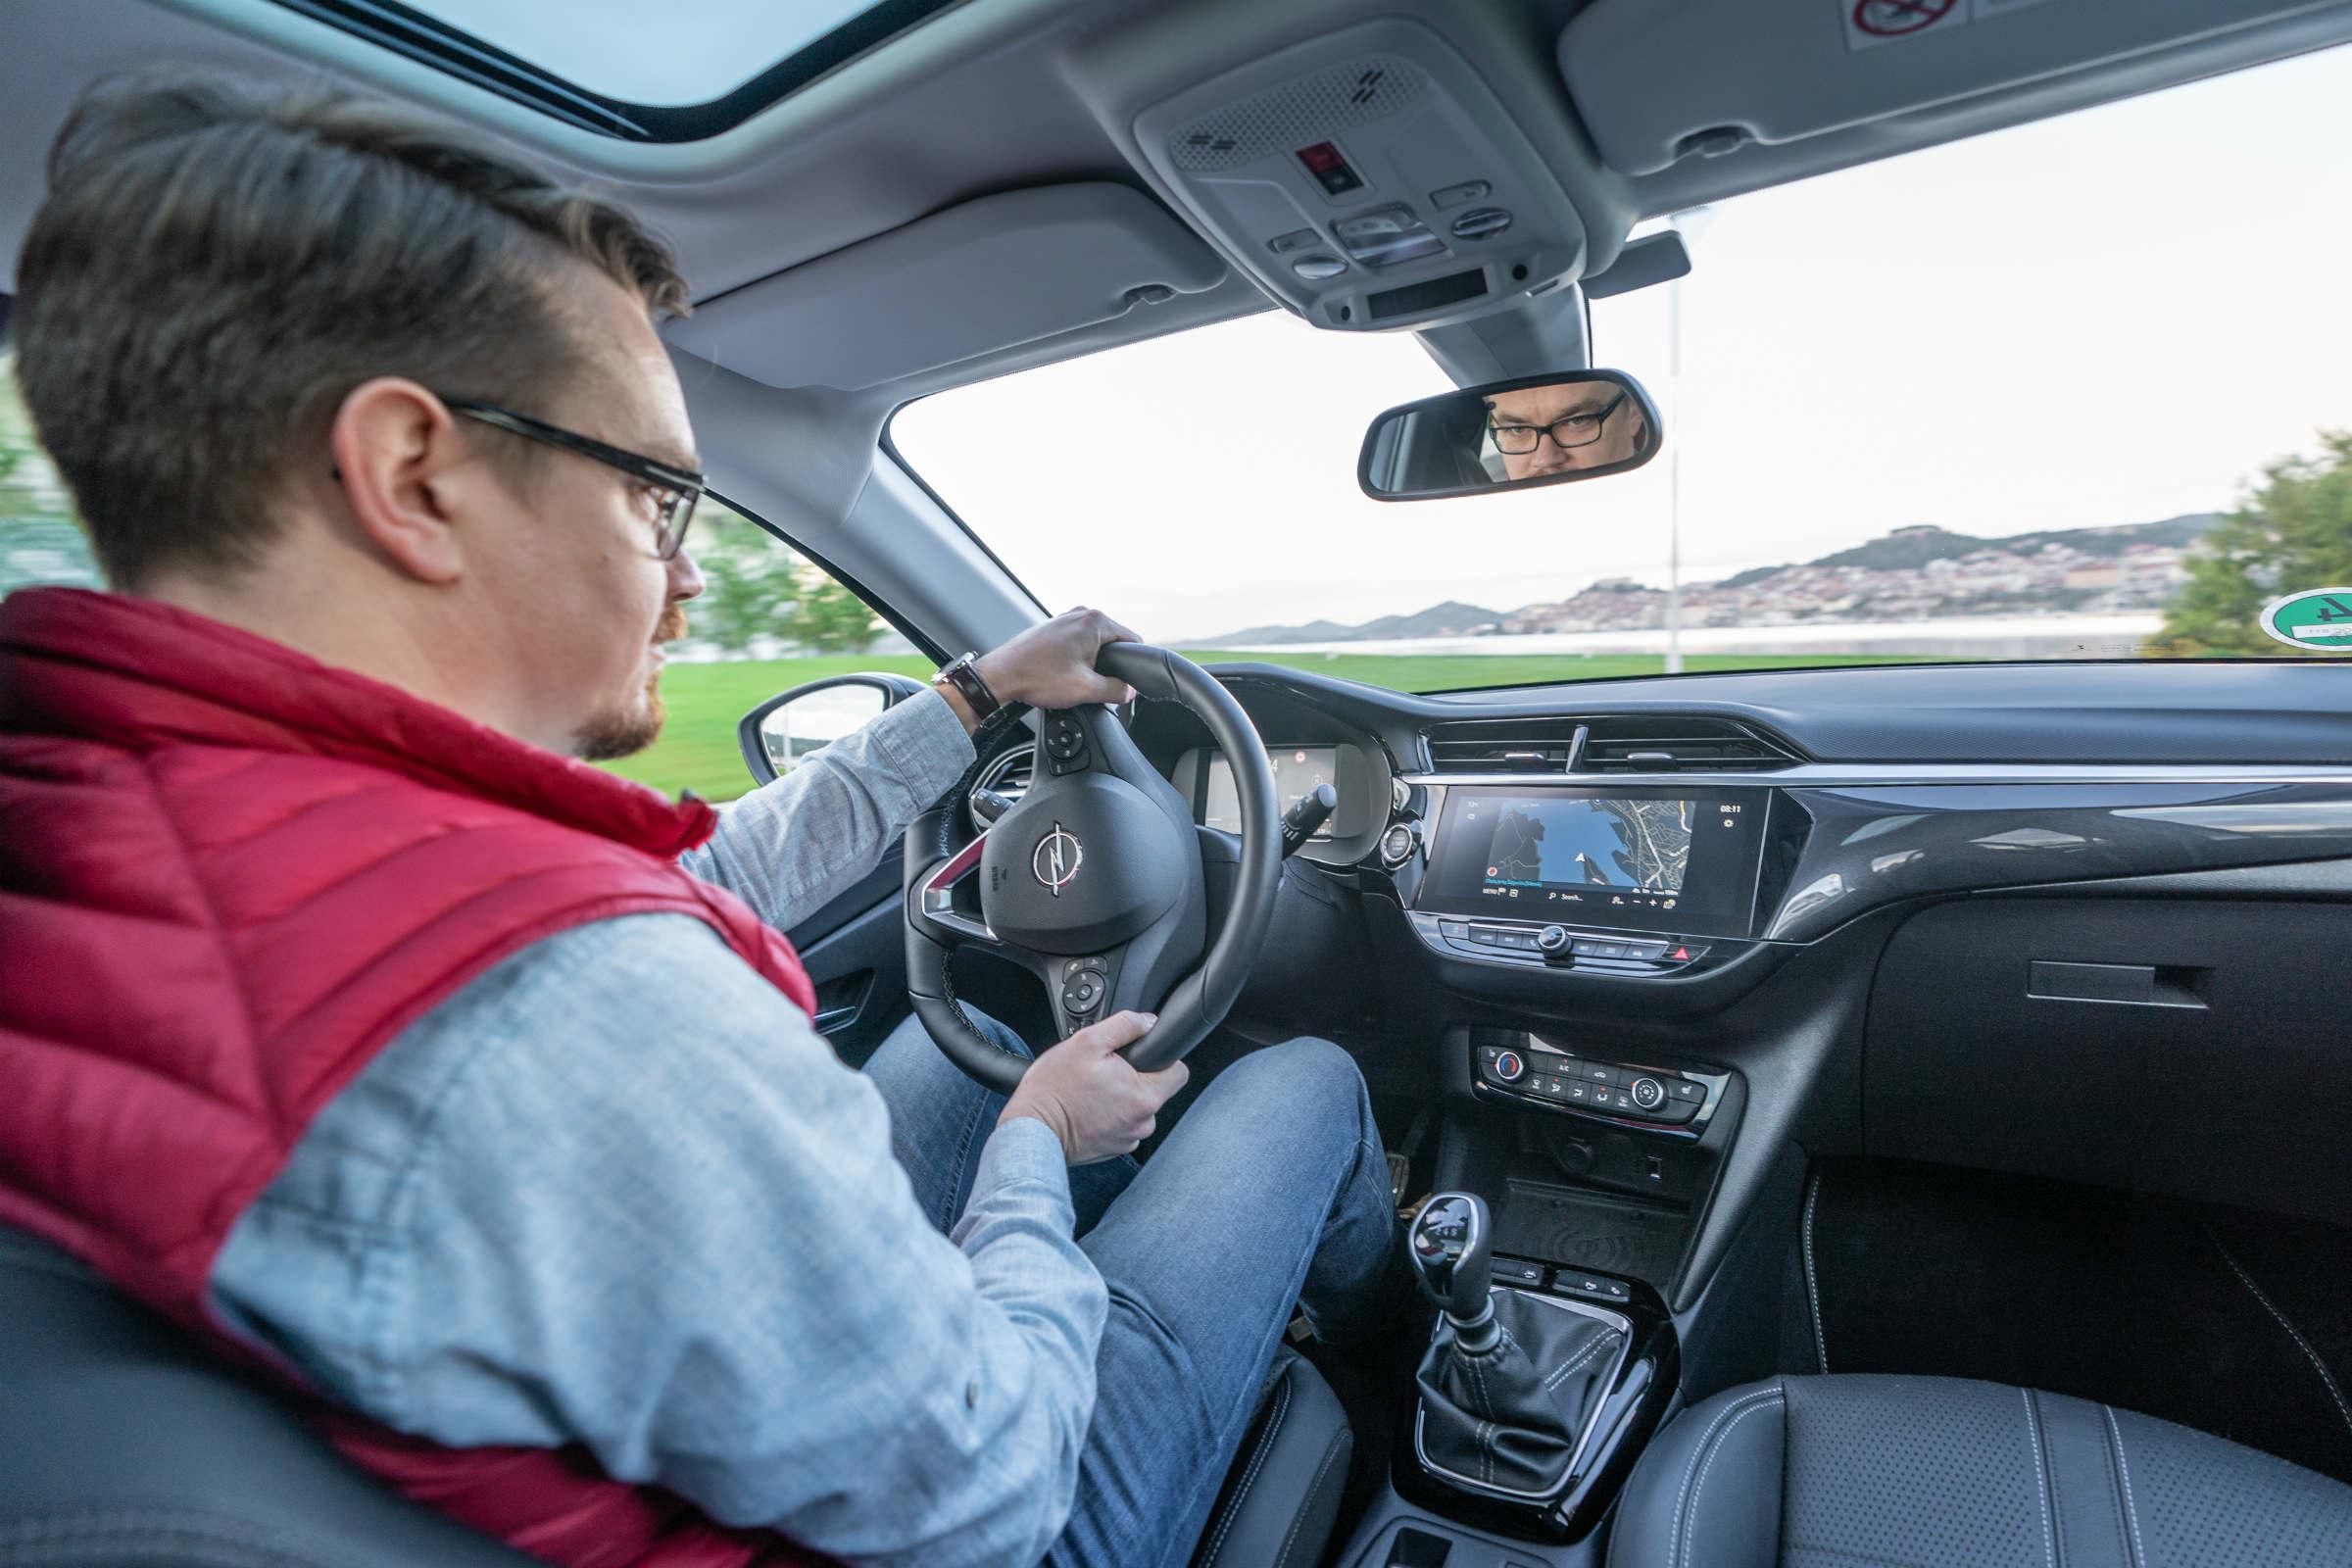 Opel Corsa test